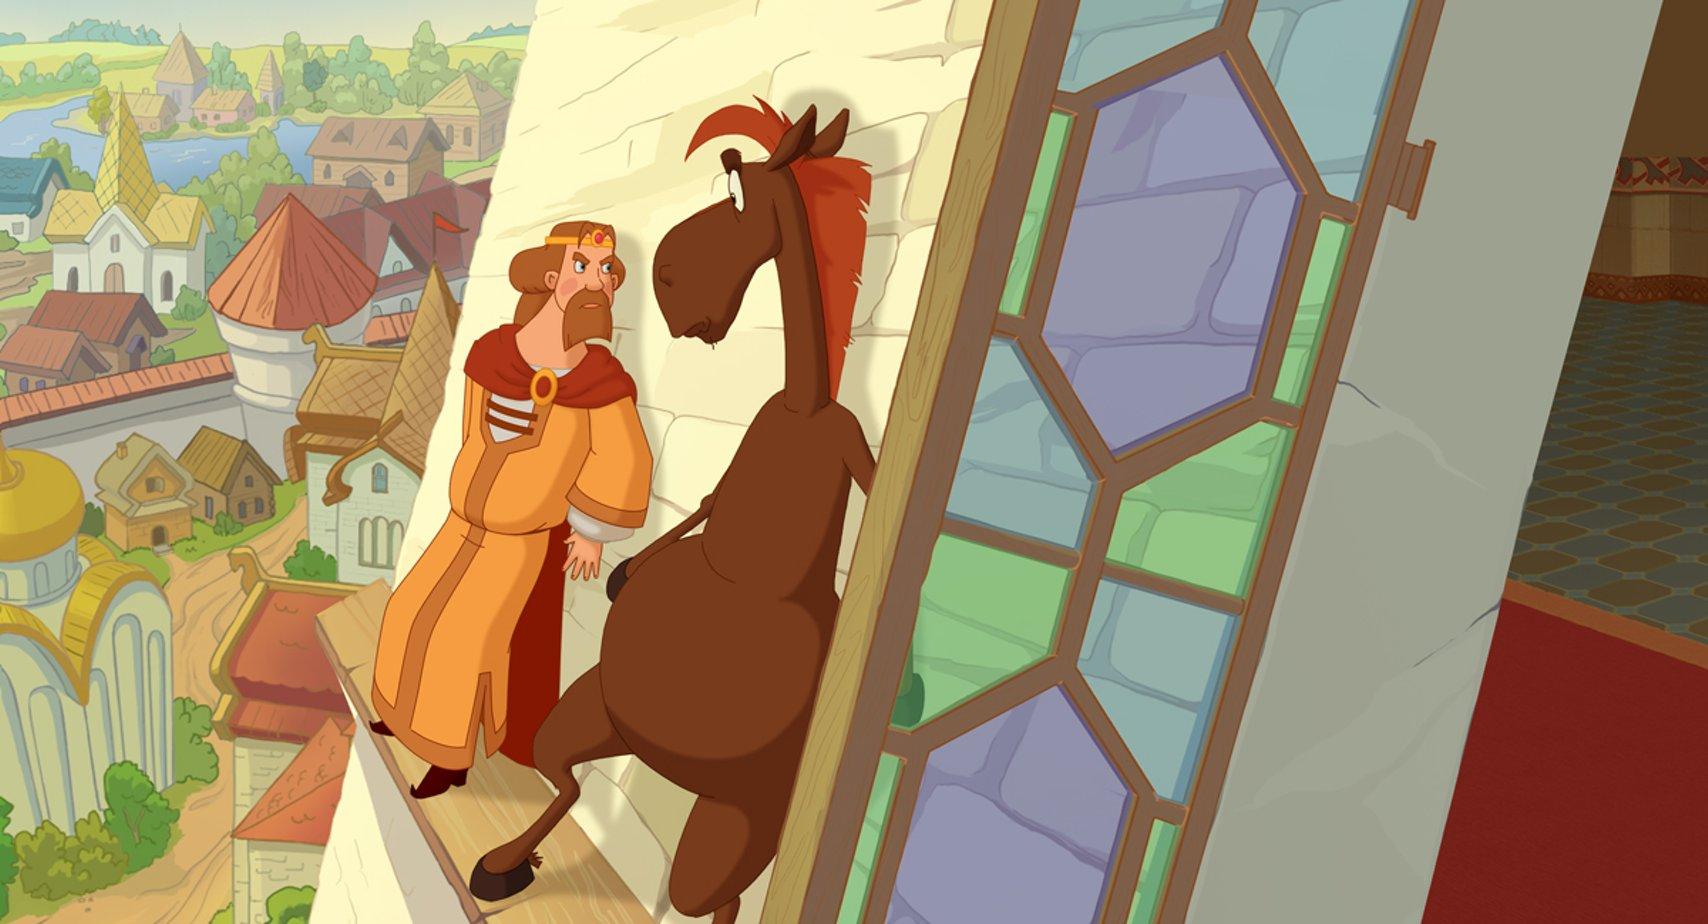 картинки из трех богатырей ход конем